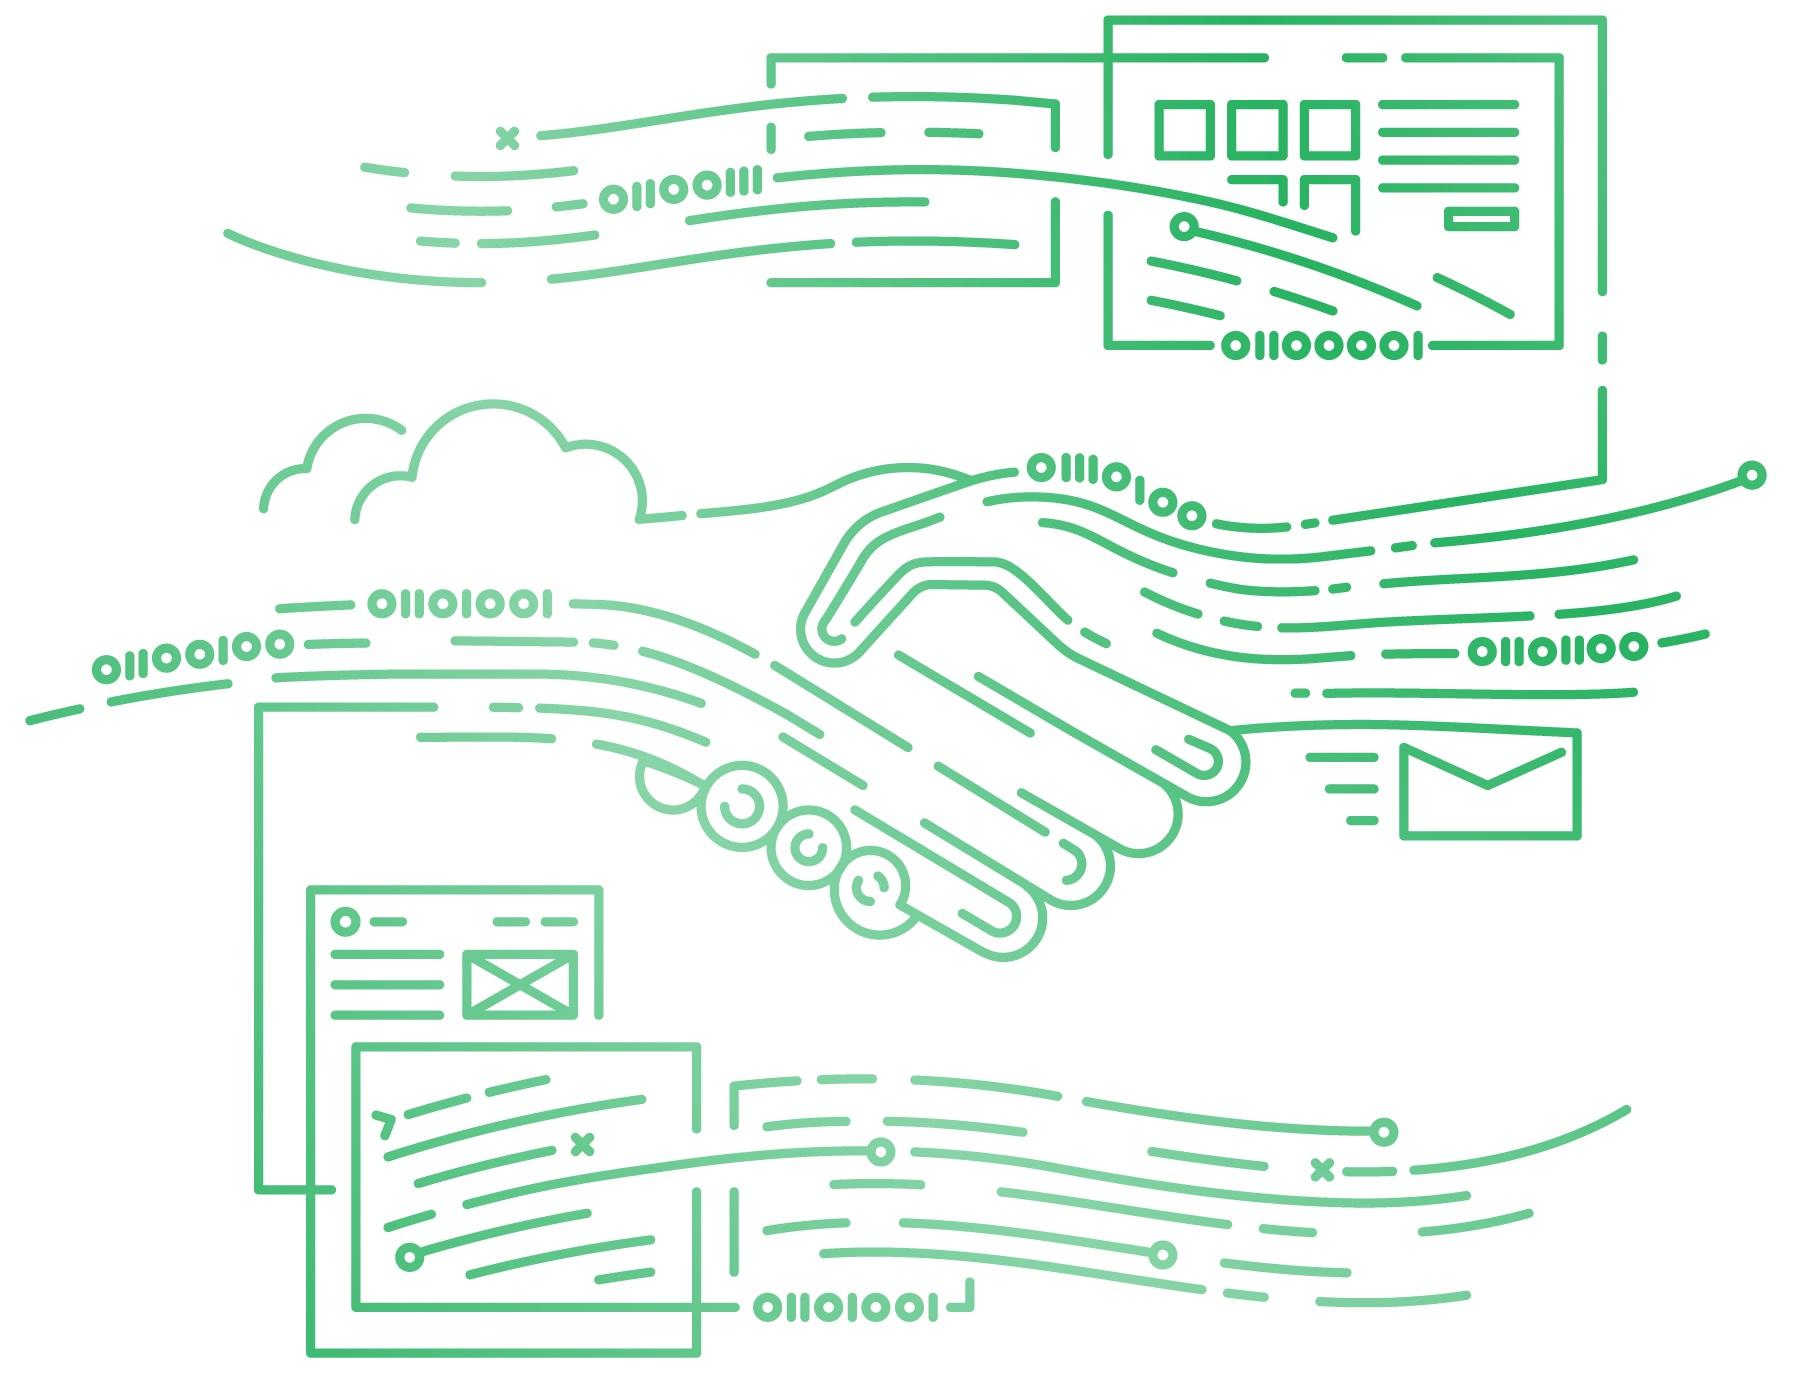 Augusto-Digital-Handshake